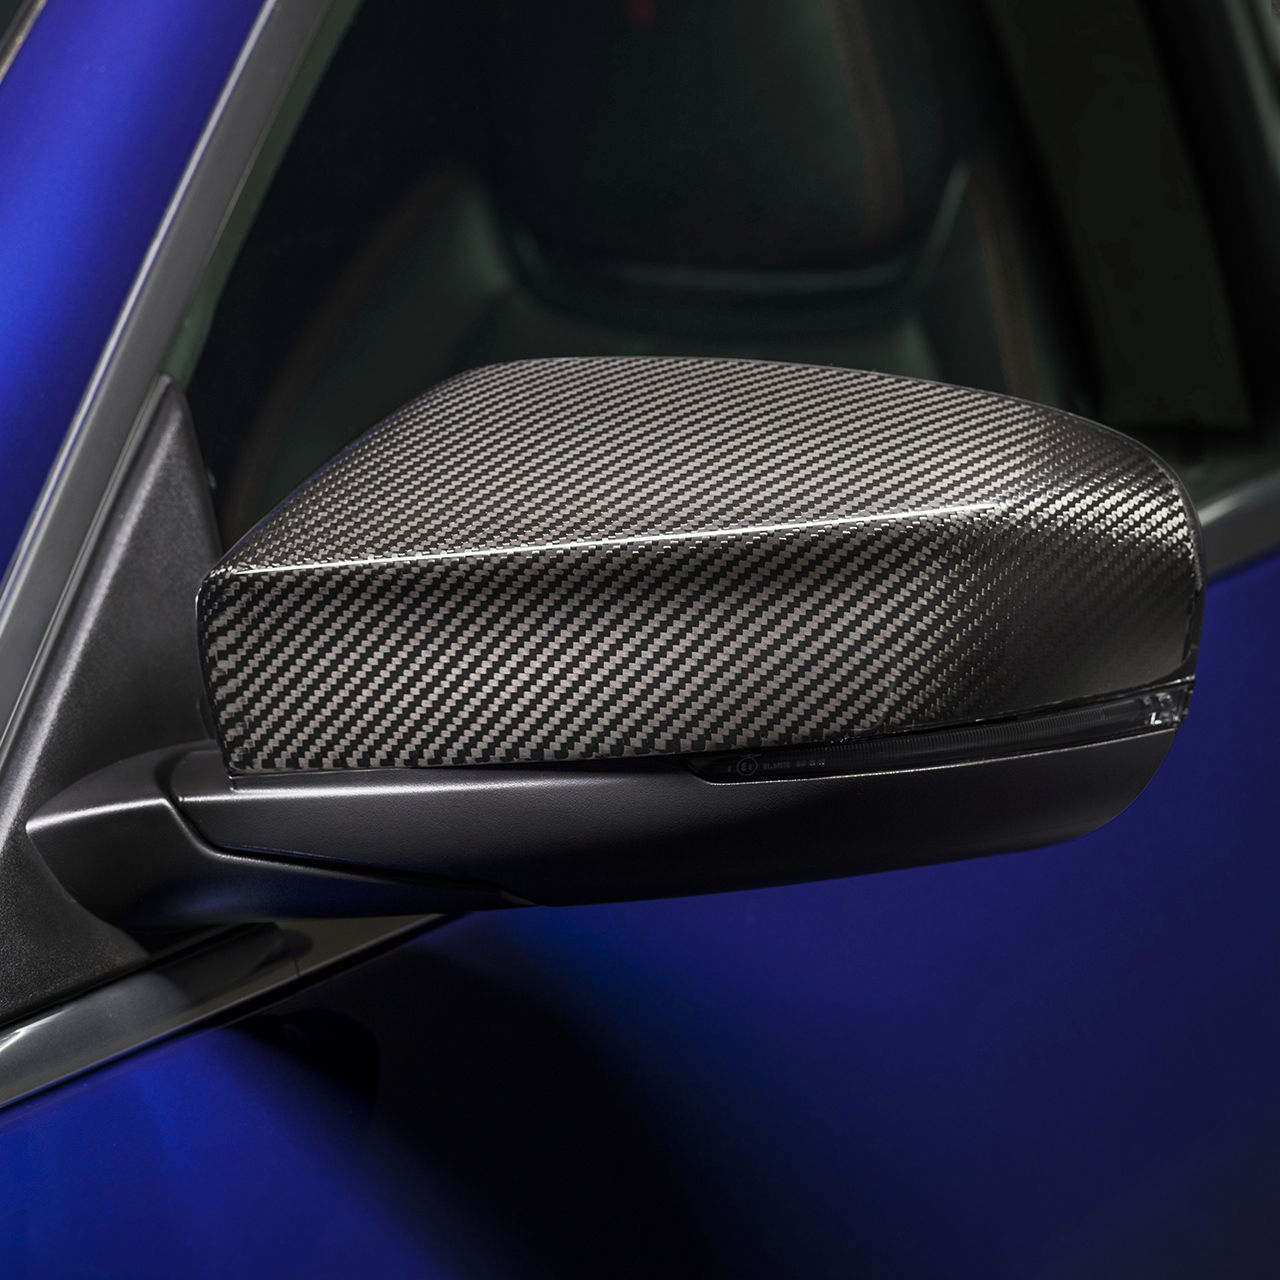 Maserati Ghibli - Exterieur - Seitenspiegel - Nerissimo Carbon Pakete